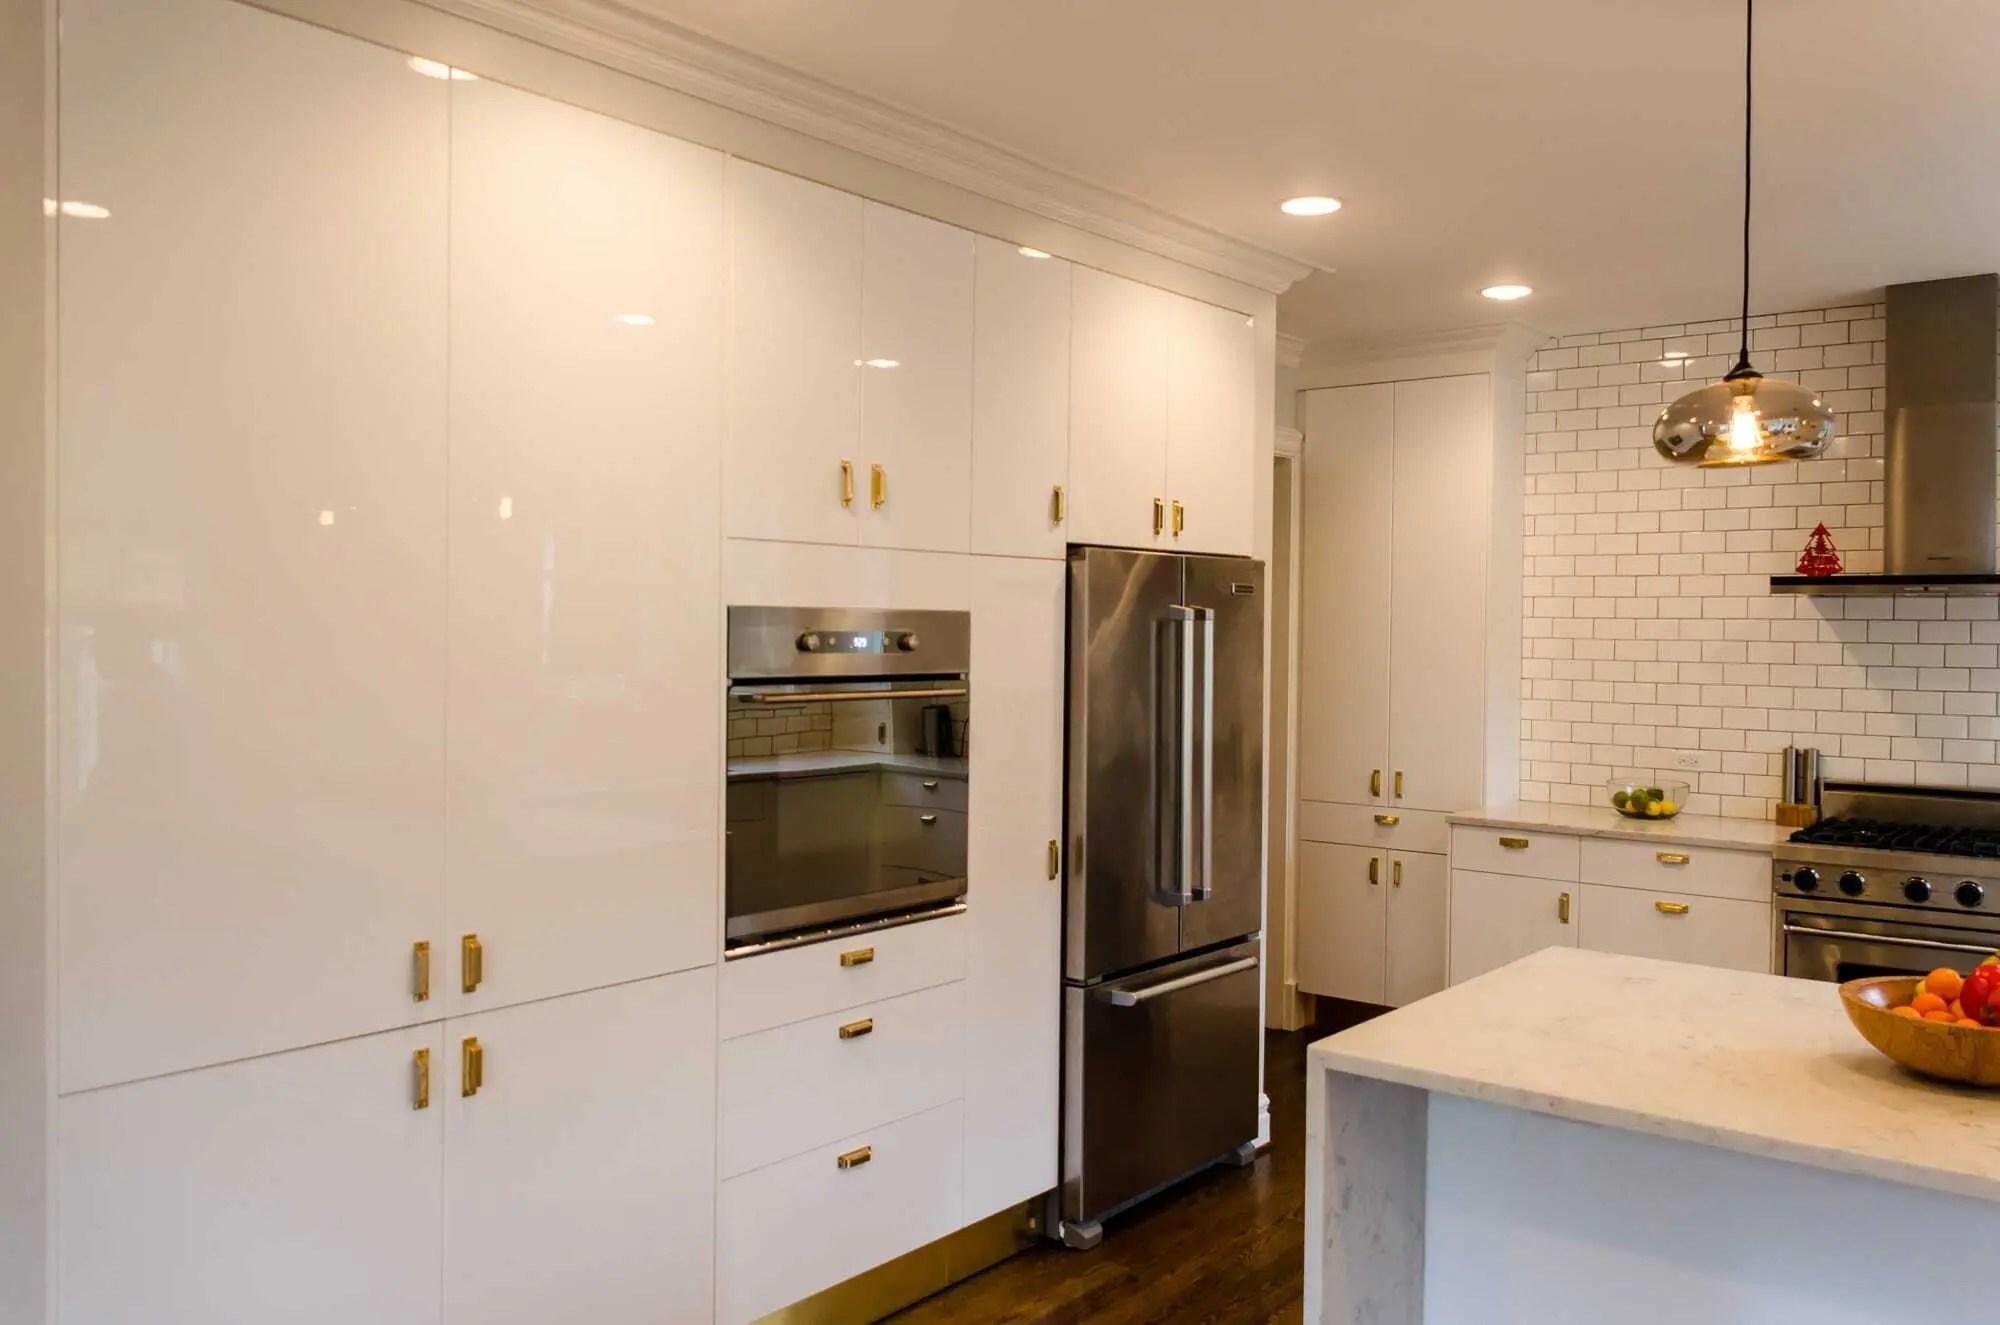 ikea hacks ikea cabinets kitchen IKEA Pantry Cabinets